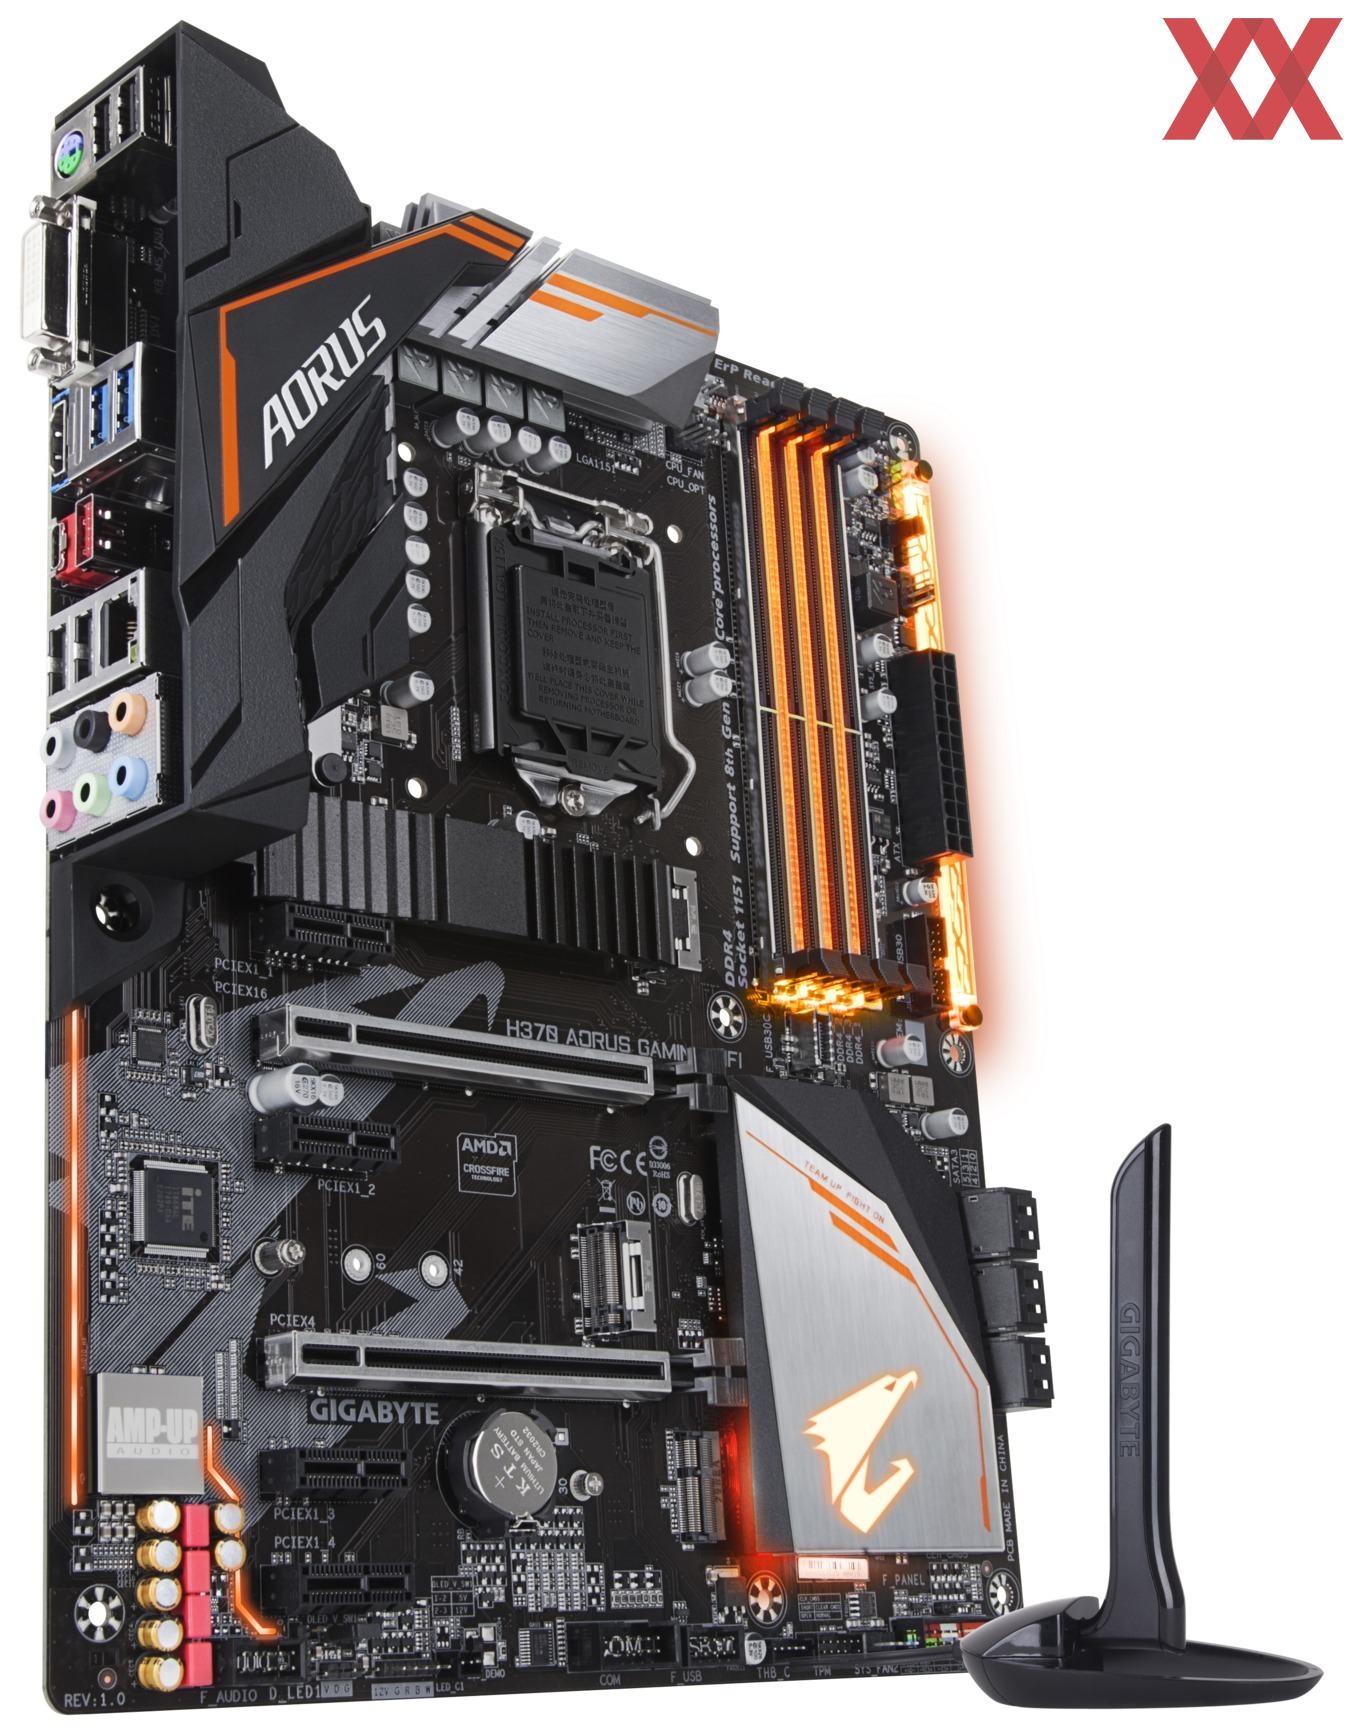 GIGABYTE H370 AORUS Gaming 3 (WiFi) motherboard has been